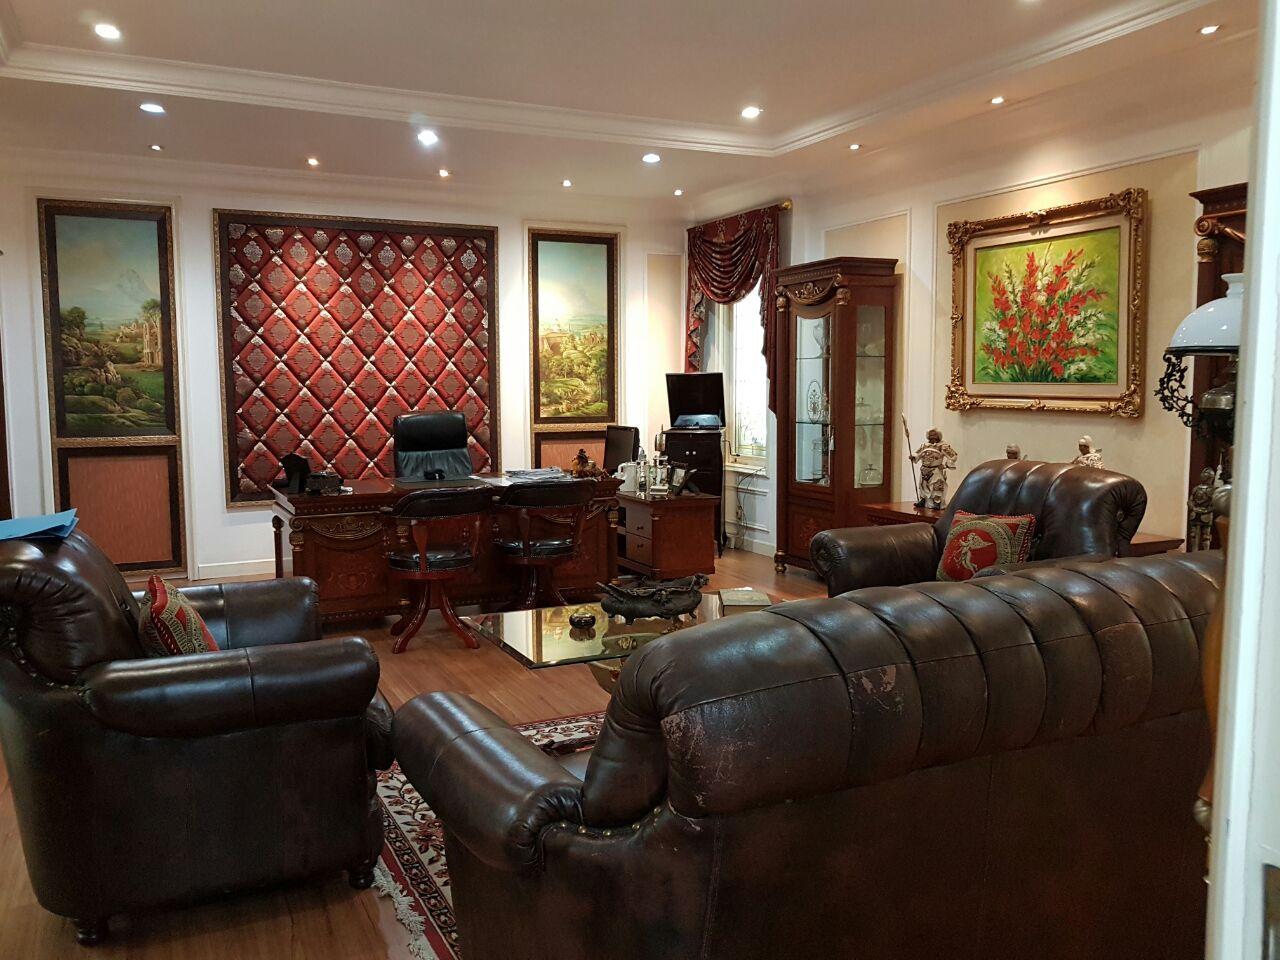 Rumah di area Panglima Polim, jalan lebar, strategis